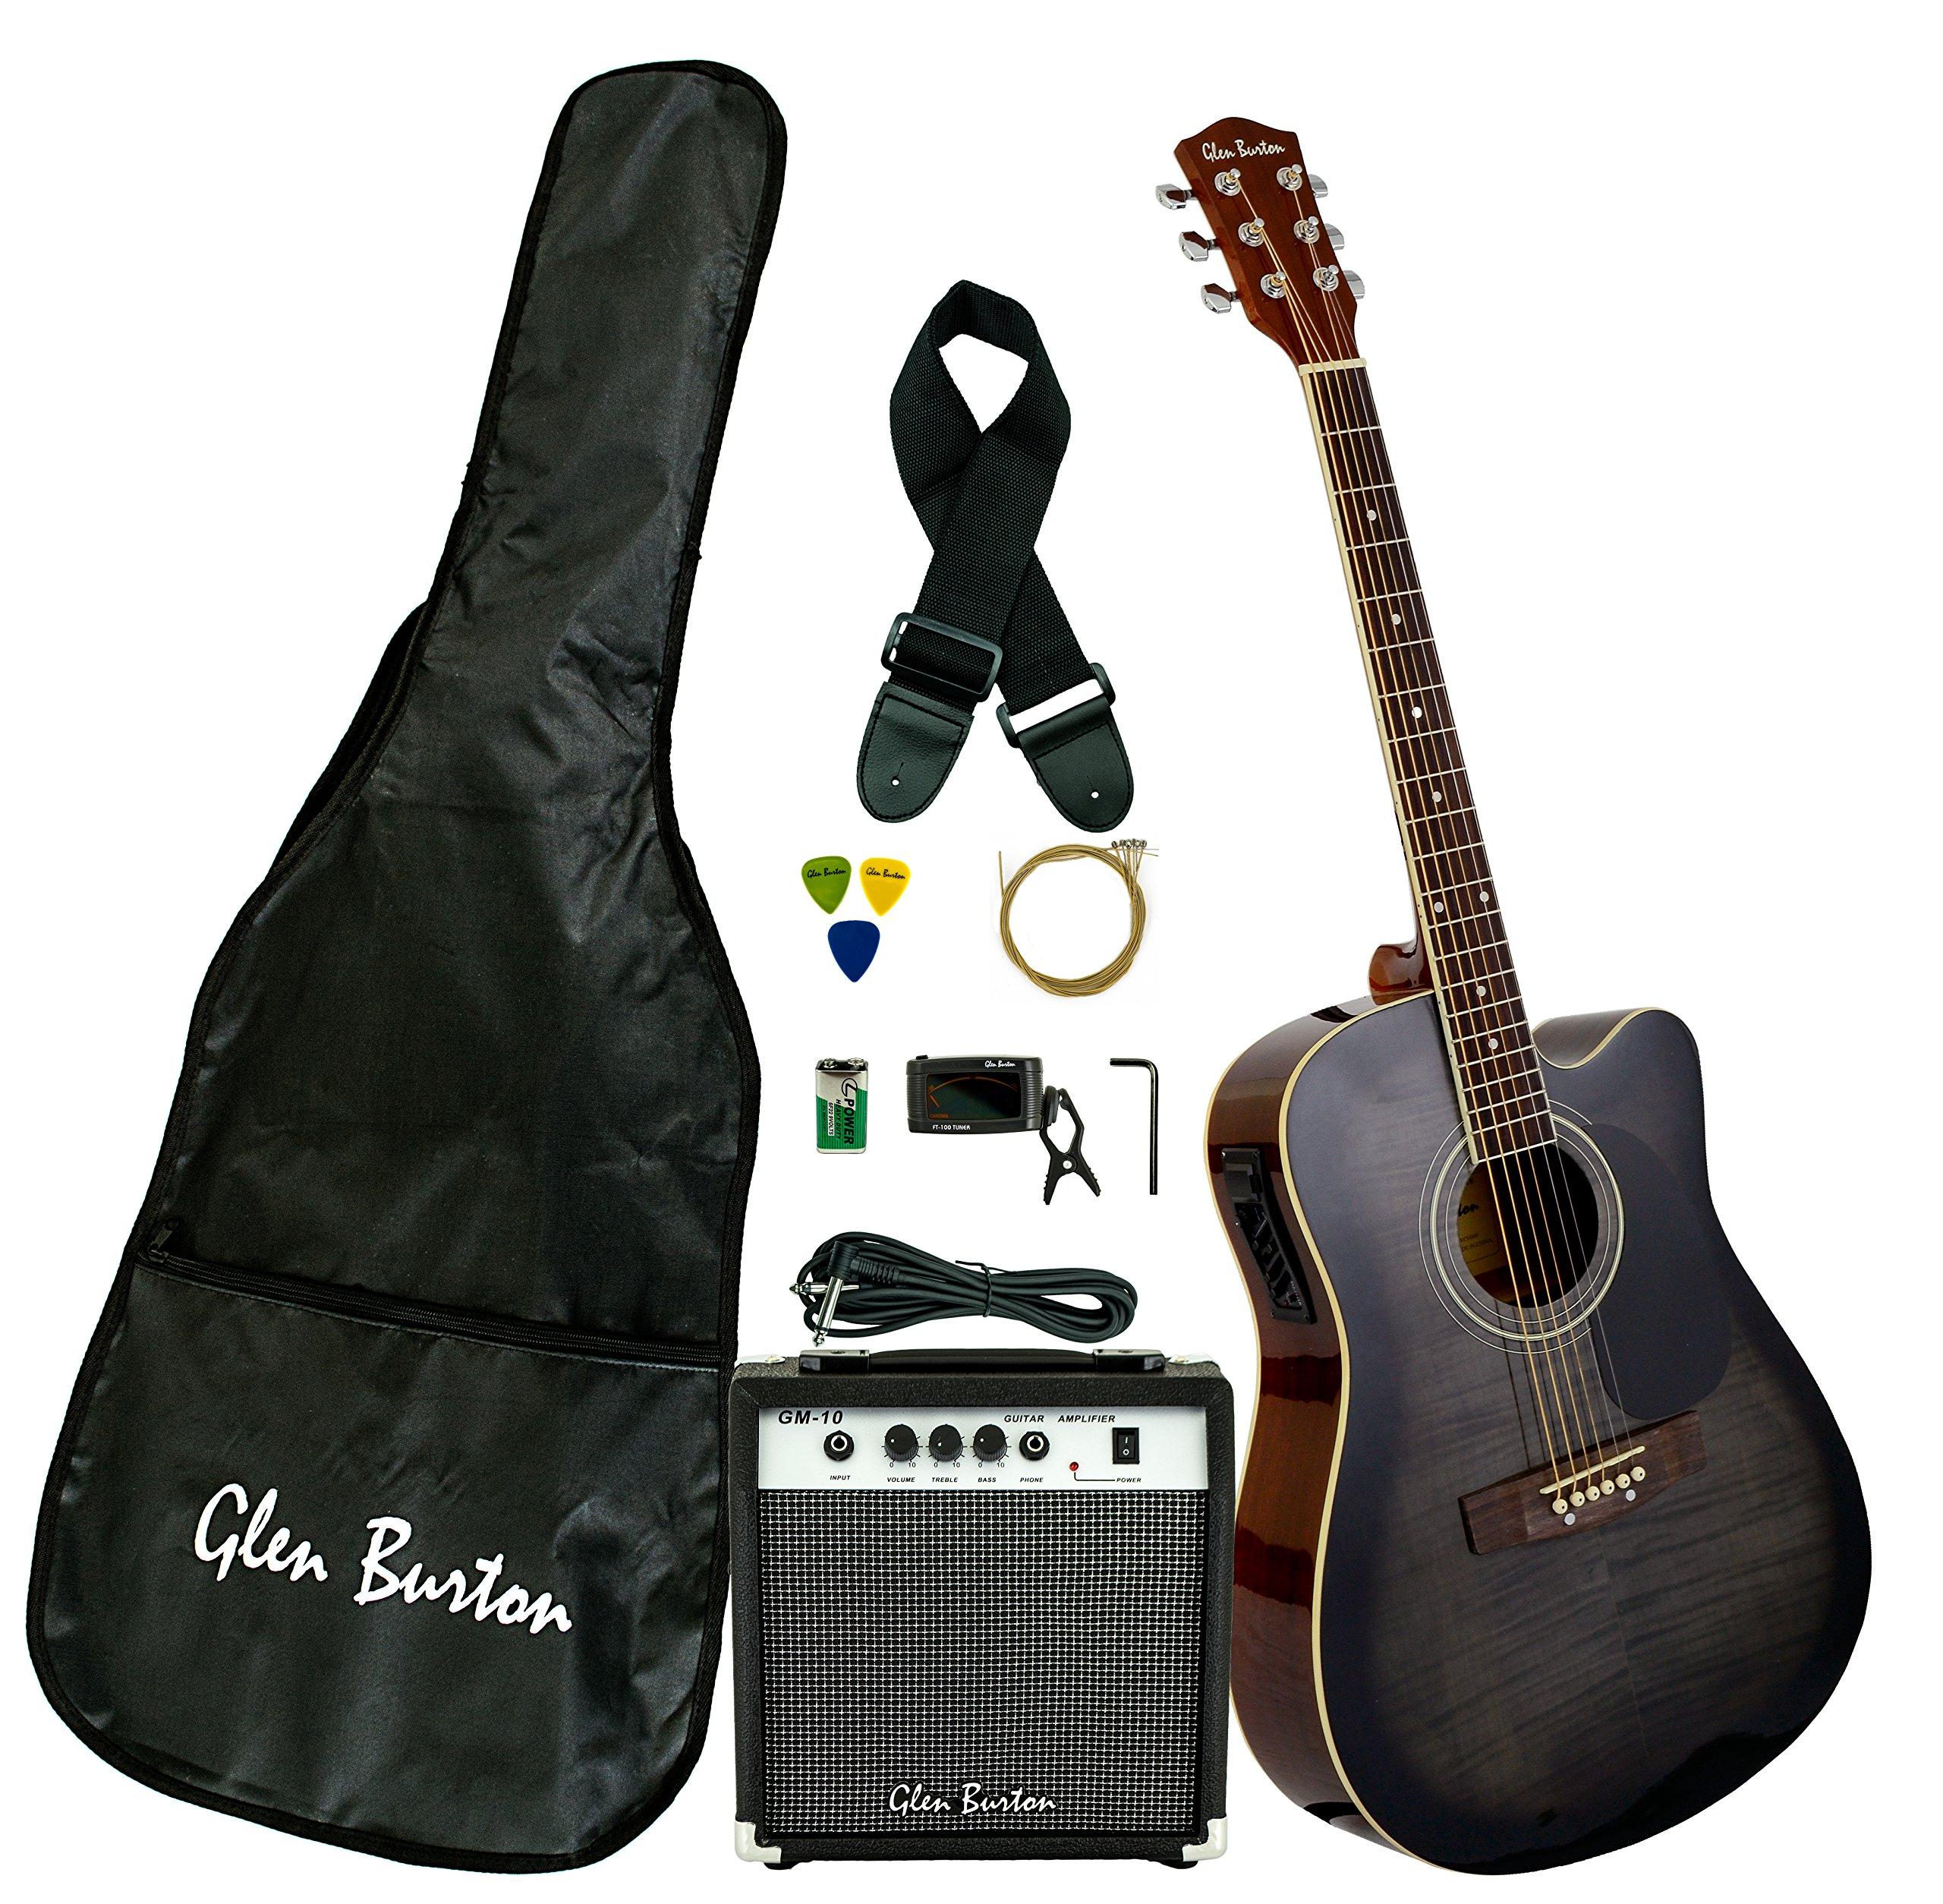 Glen Burton GA204BCO BK Acoustic Electric